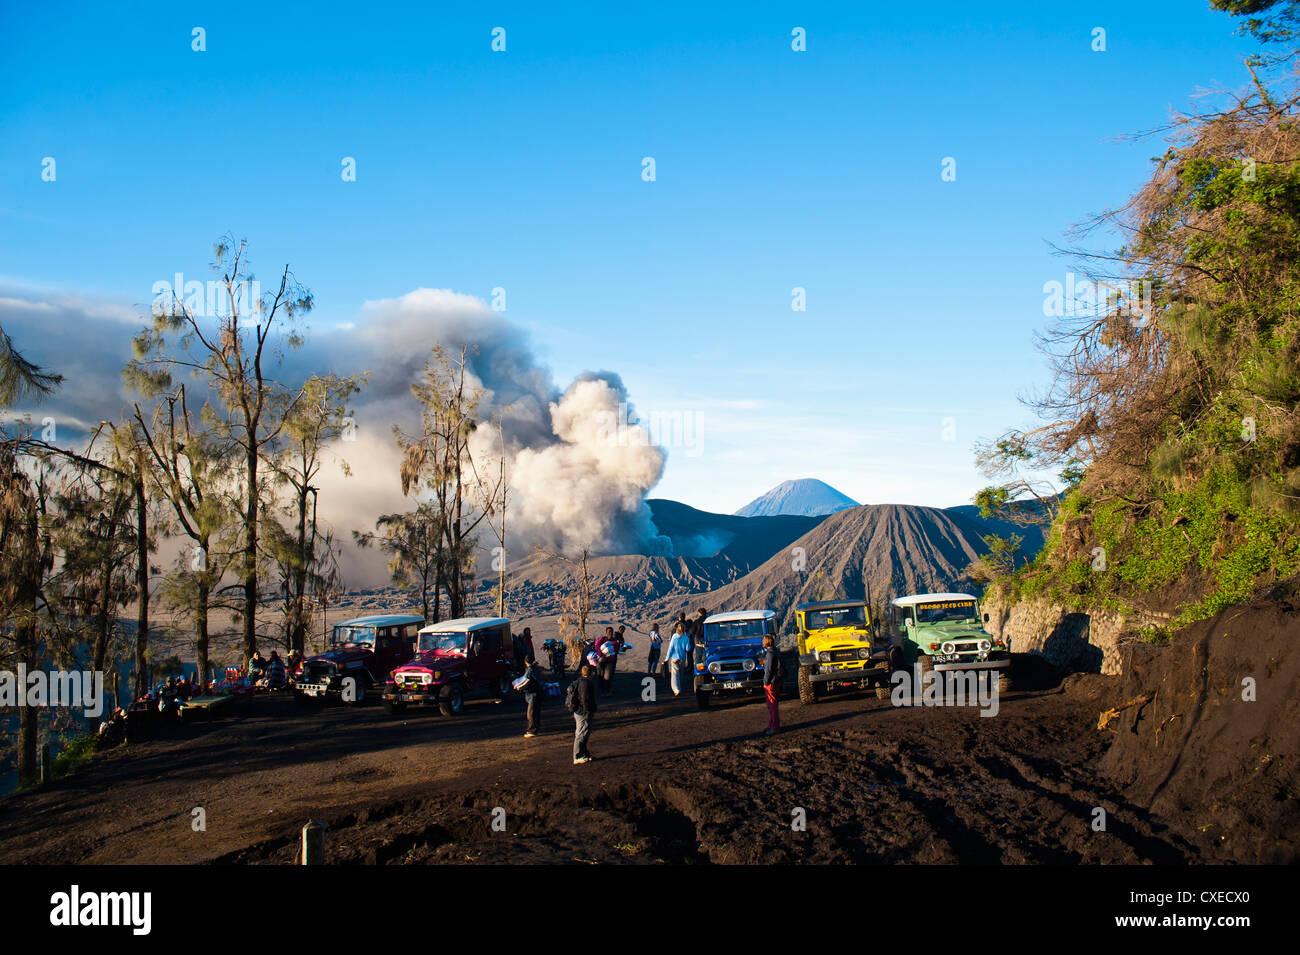 Tourist jeep tour at Mount Bromo, Bromo Tengger Semeru National Park, East Java, Indonesia, Southeast Asia, Asia - Stock Image